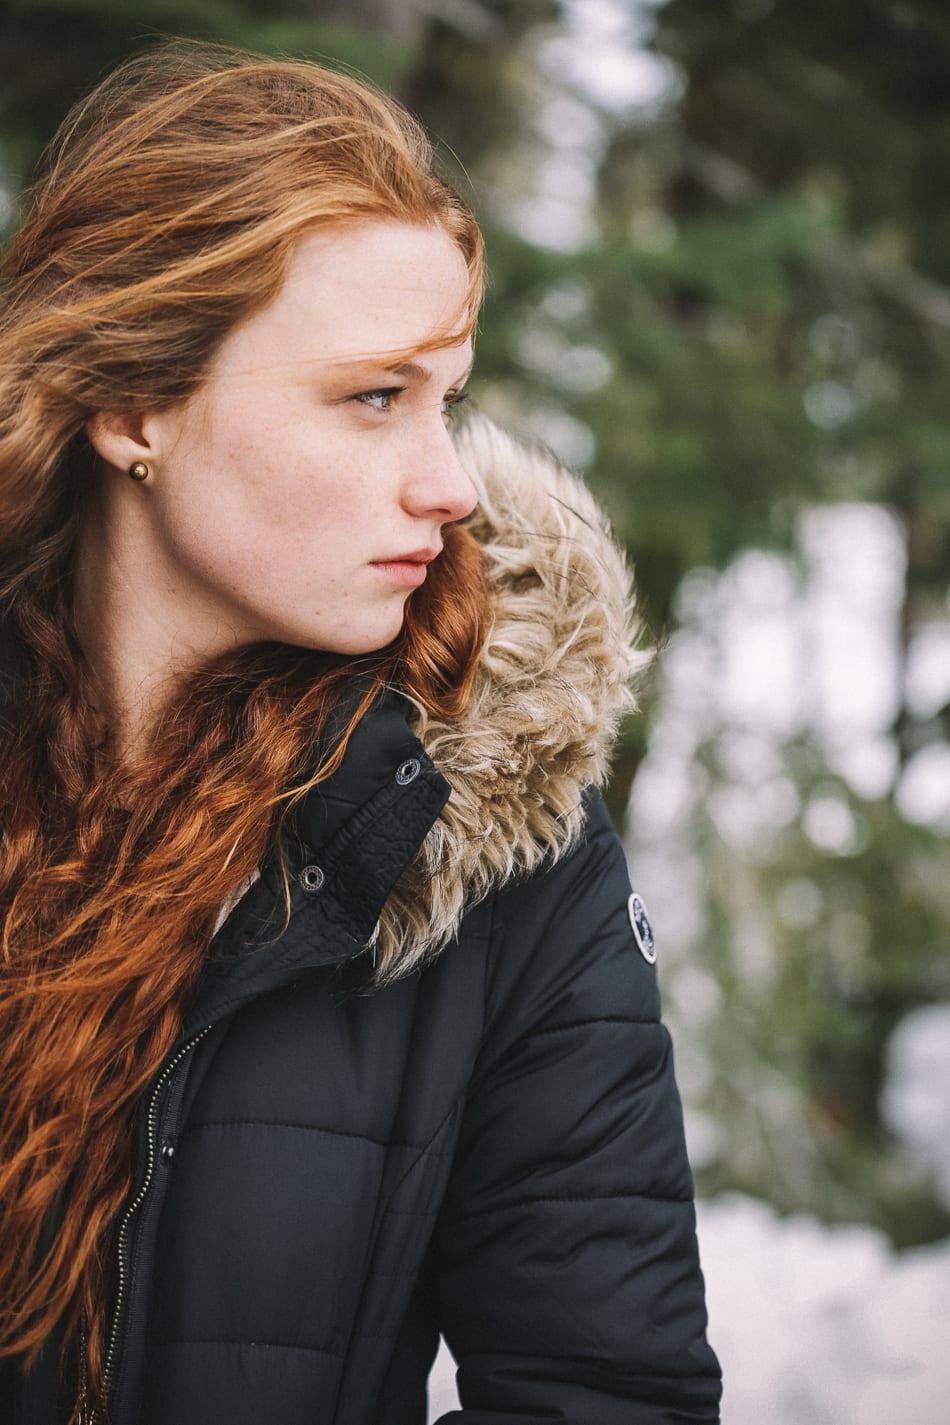 mount-lassen-winter-portrait-photo-10